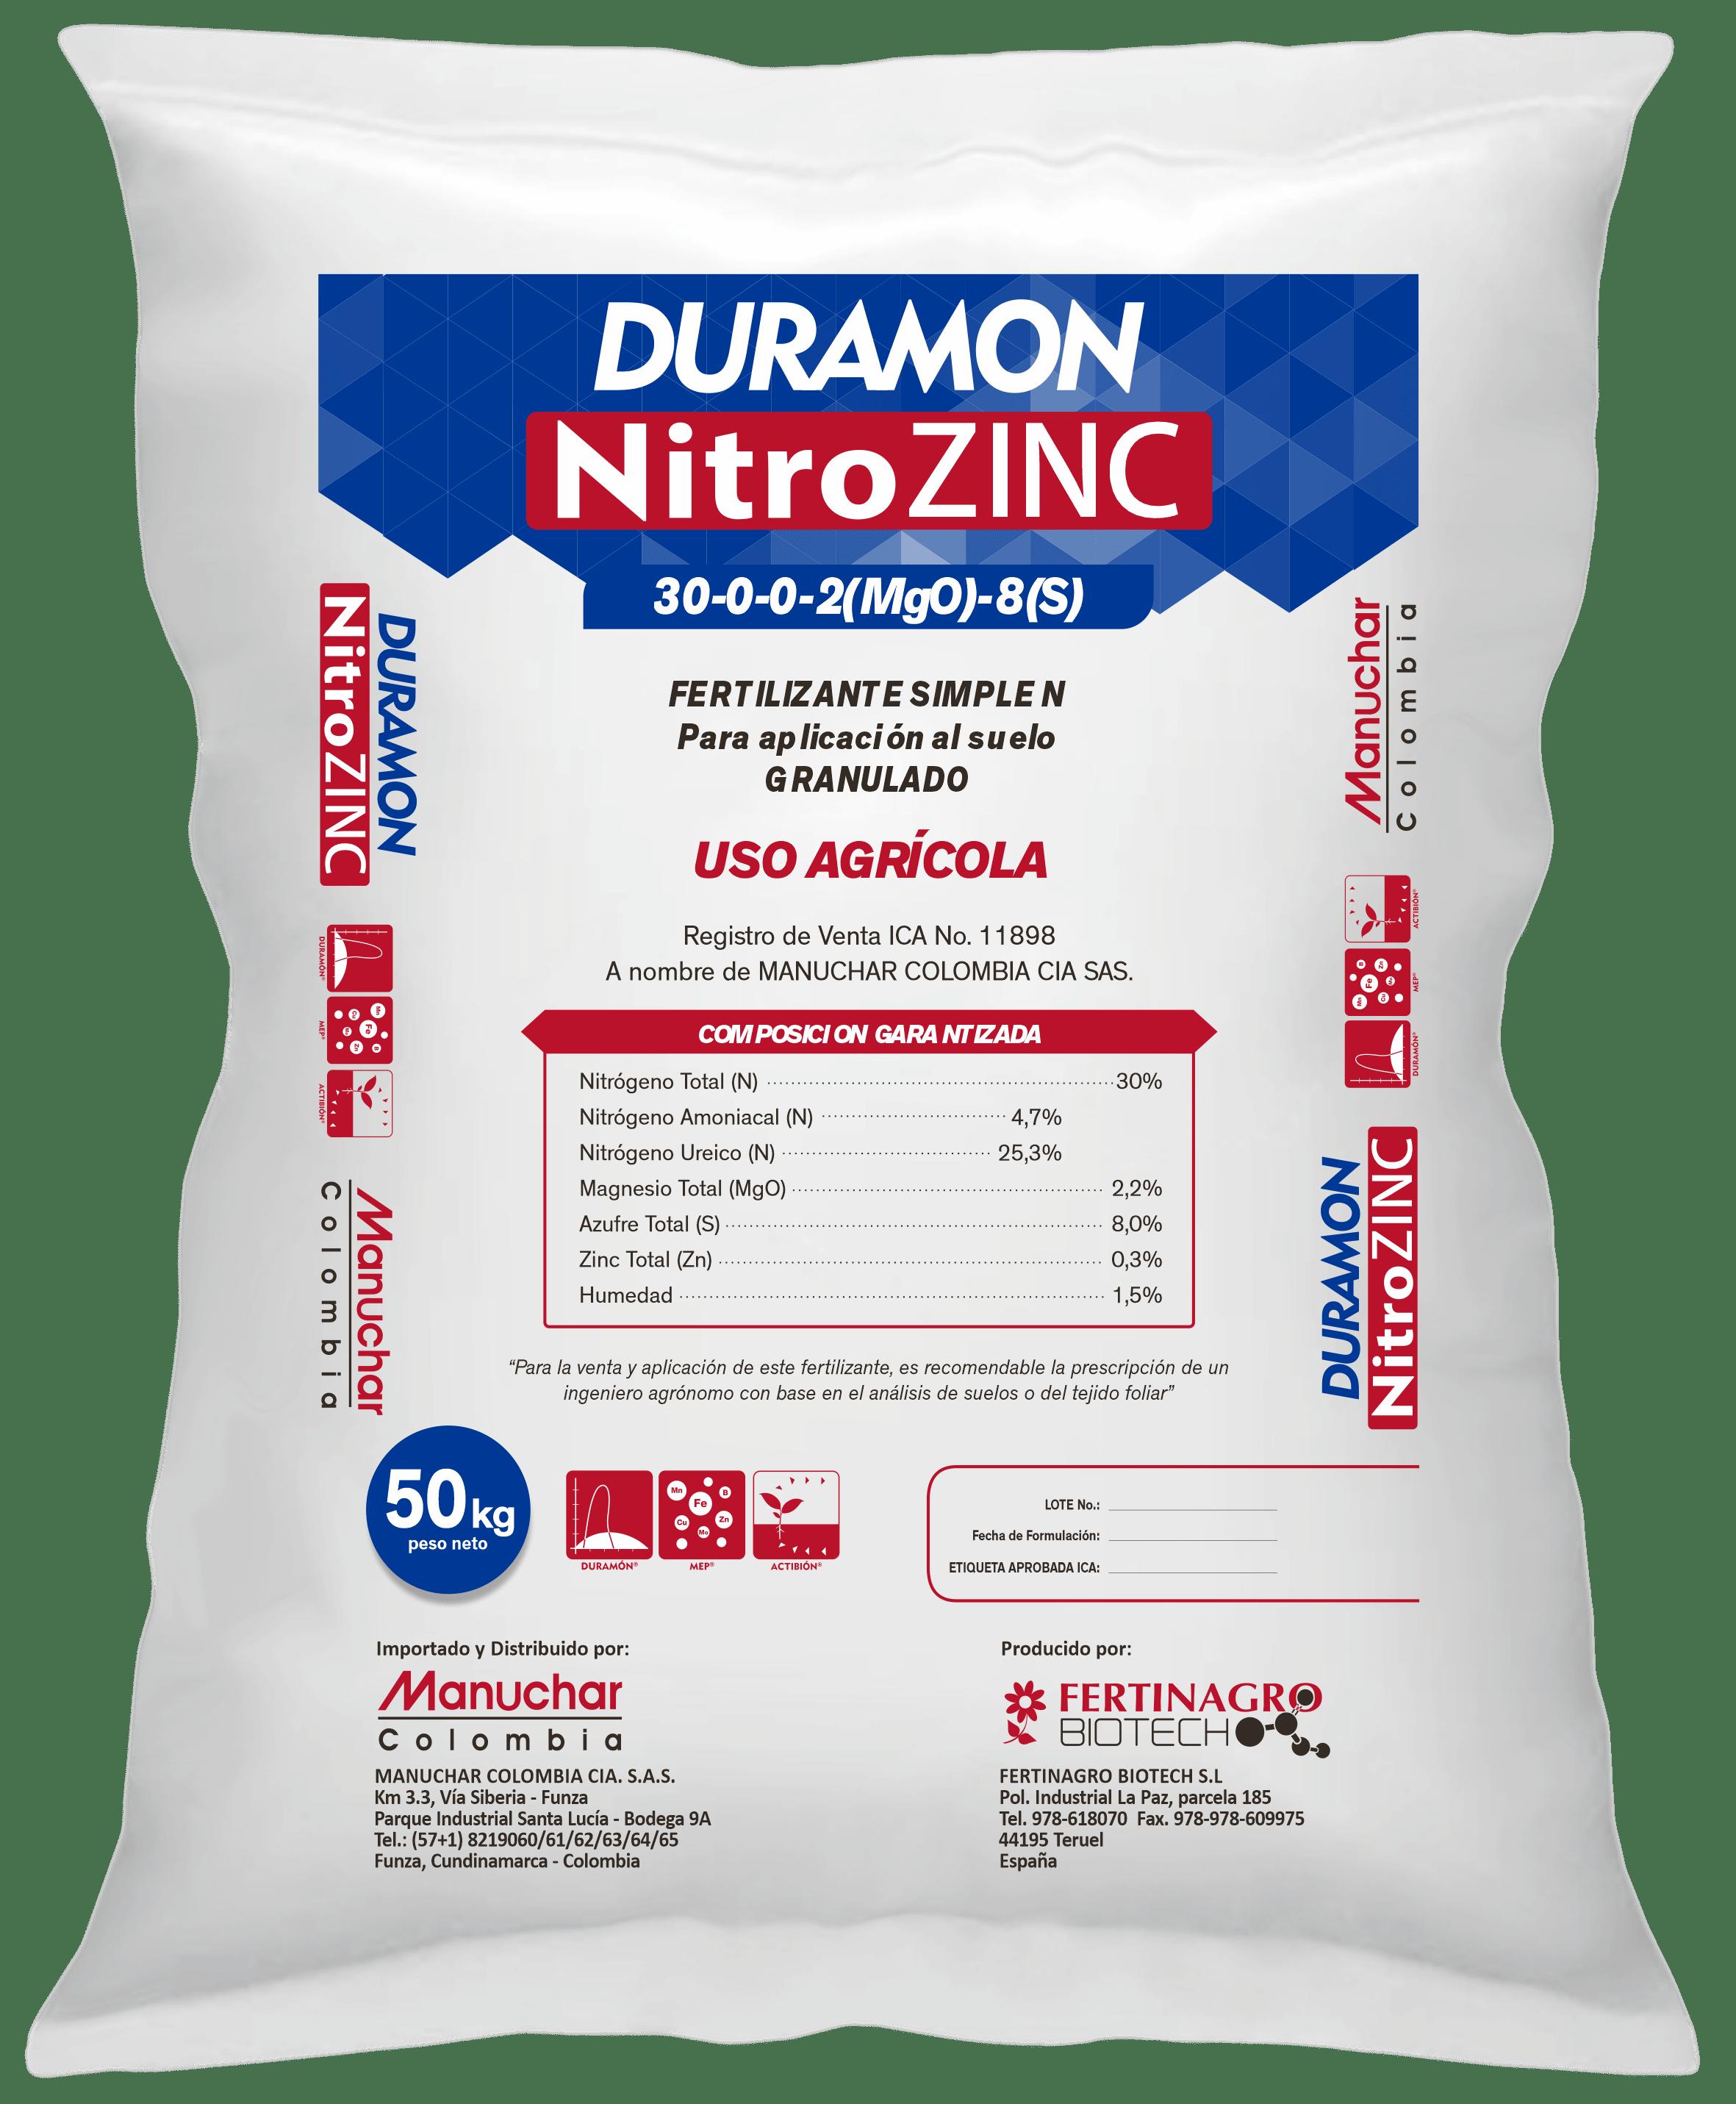 Fertilizante simple duramon nitrozinc